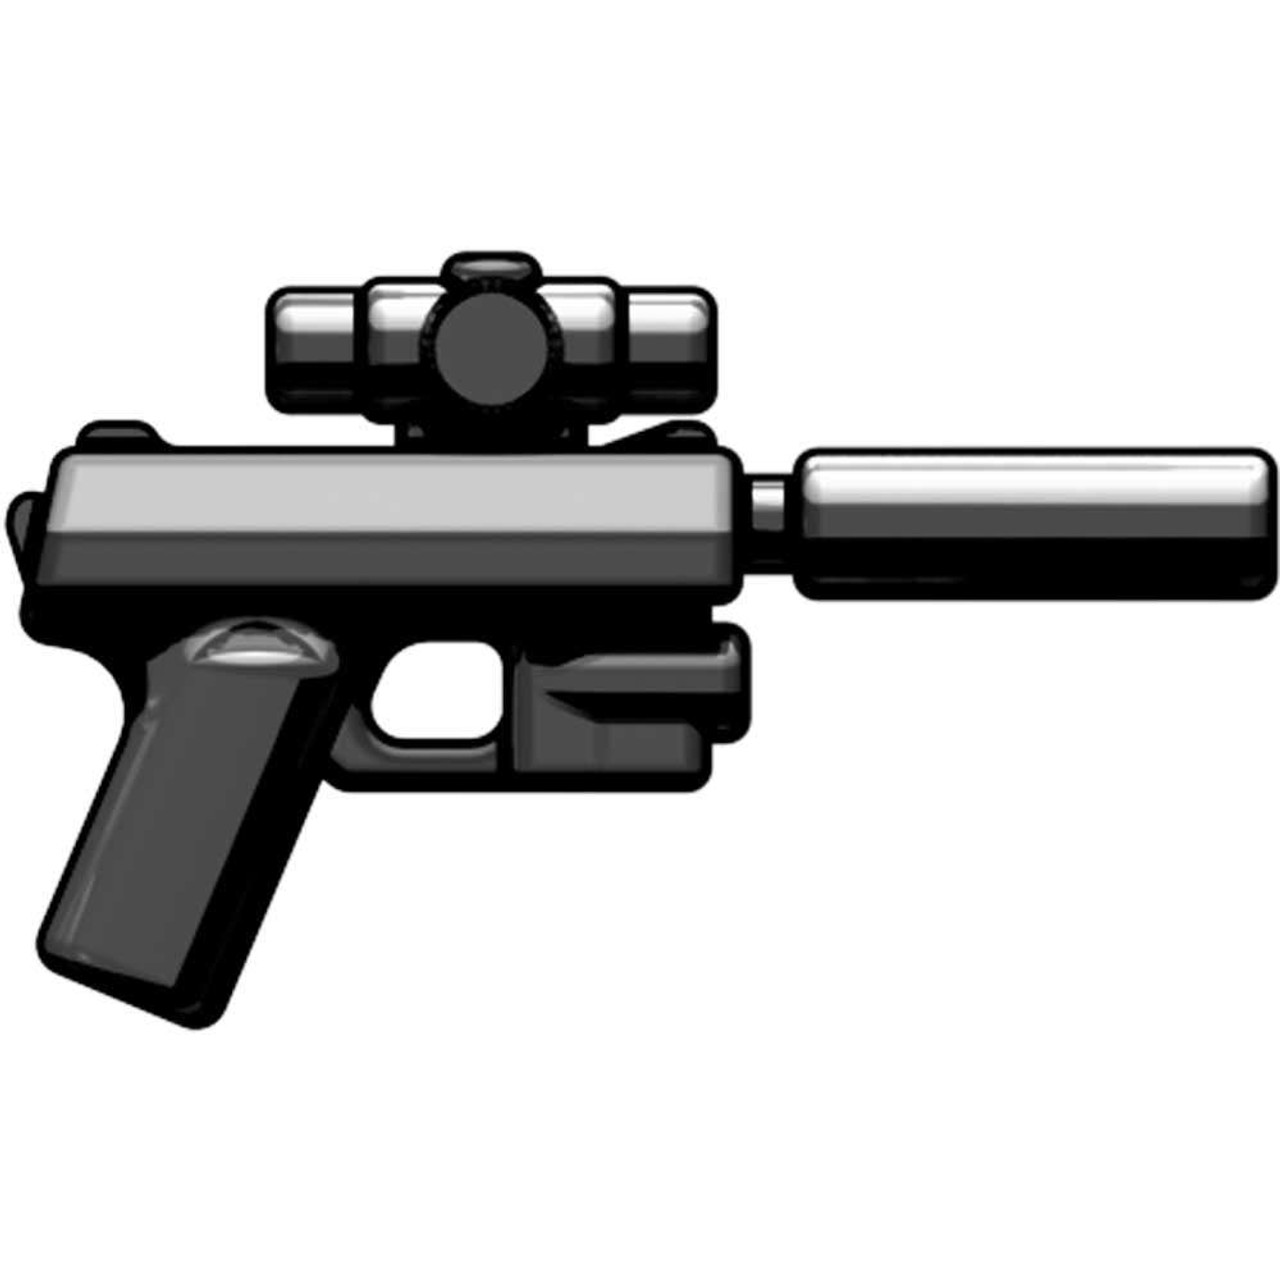 BrickArms Weapons M23 SOCOM Pistol 2.5-Inch [Black]